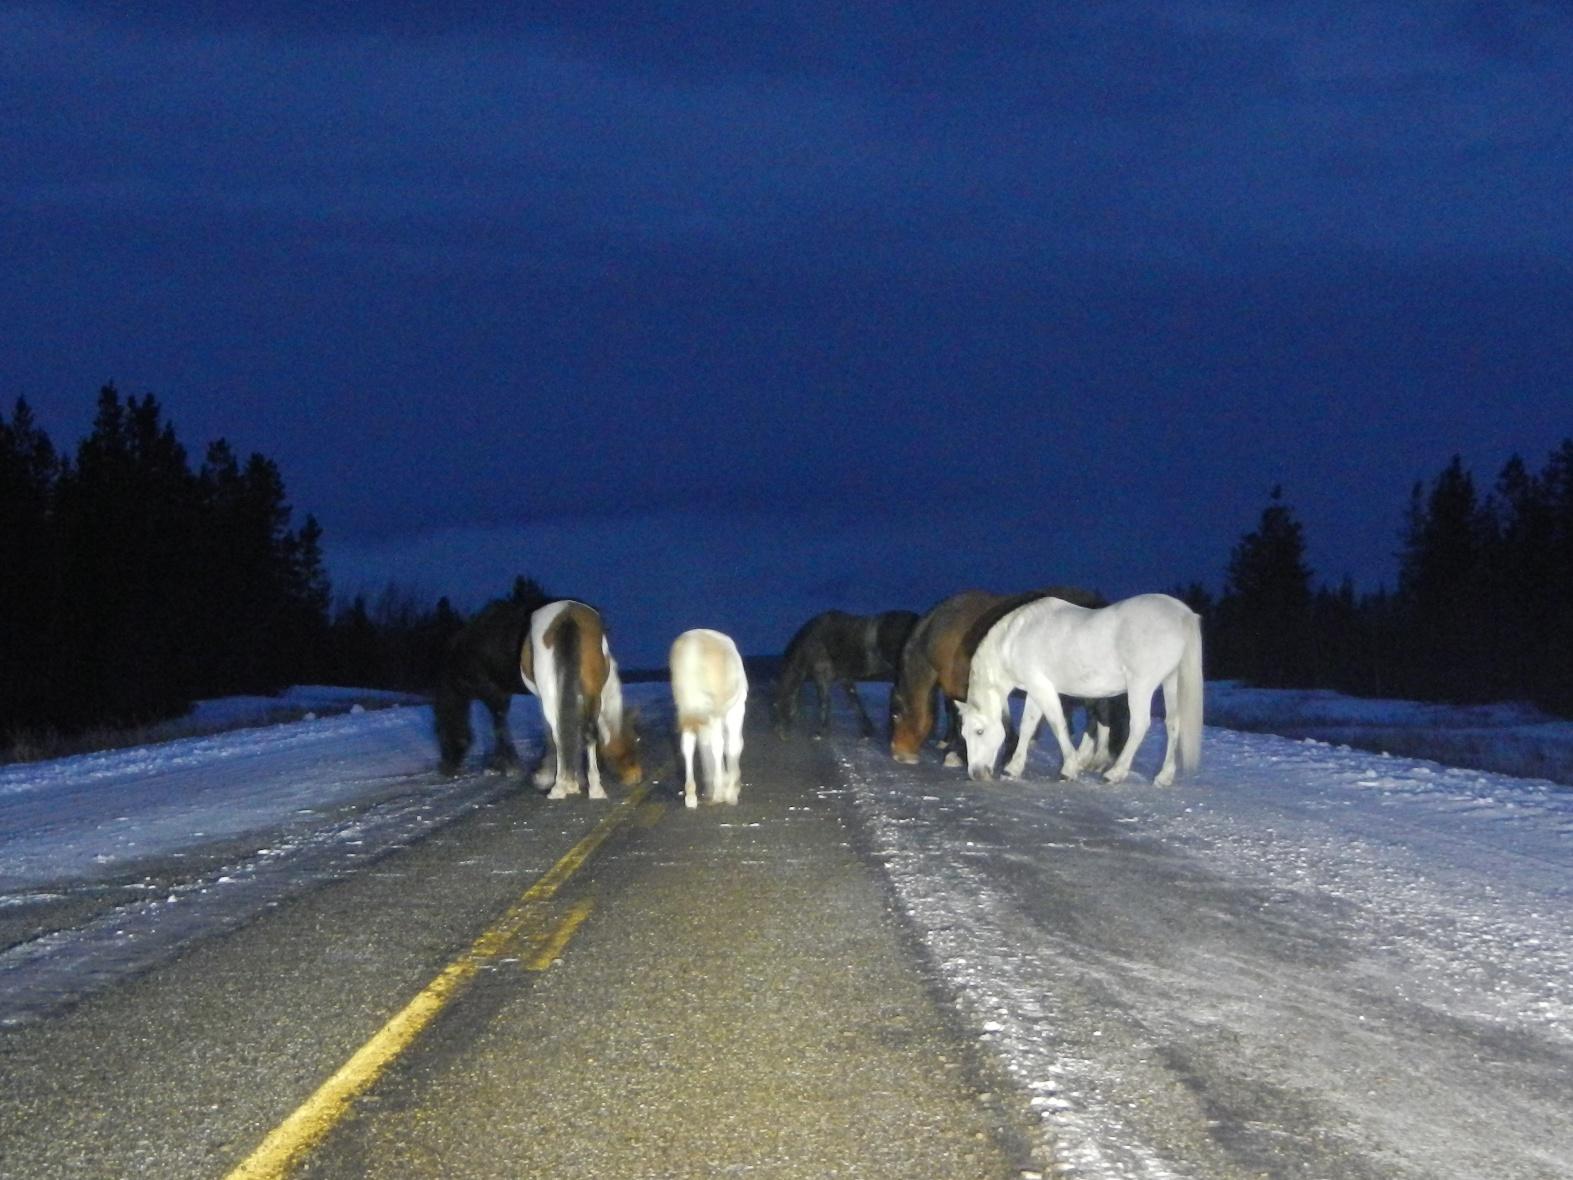 The Alaska Canada Highway Guide Road Trip Planner AlCan Photos - Trip to alaska